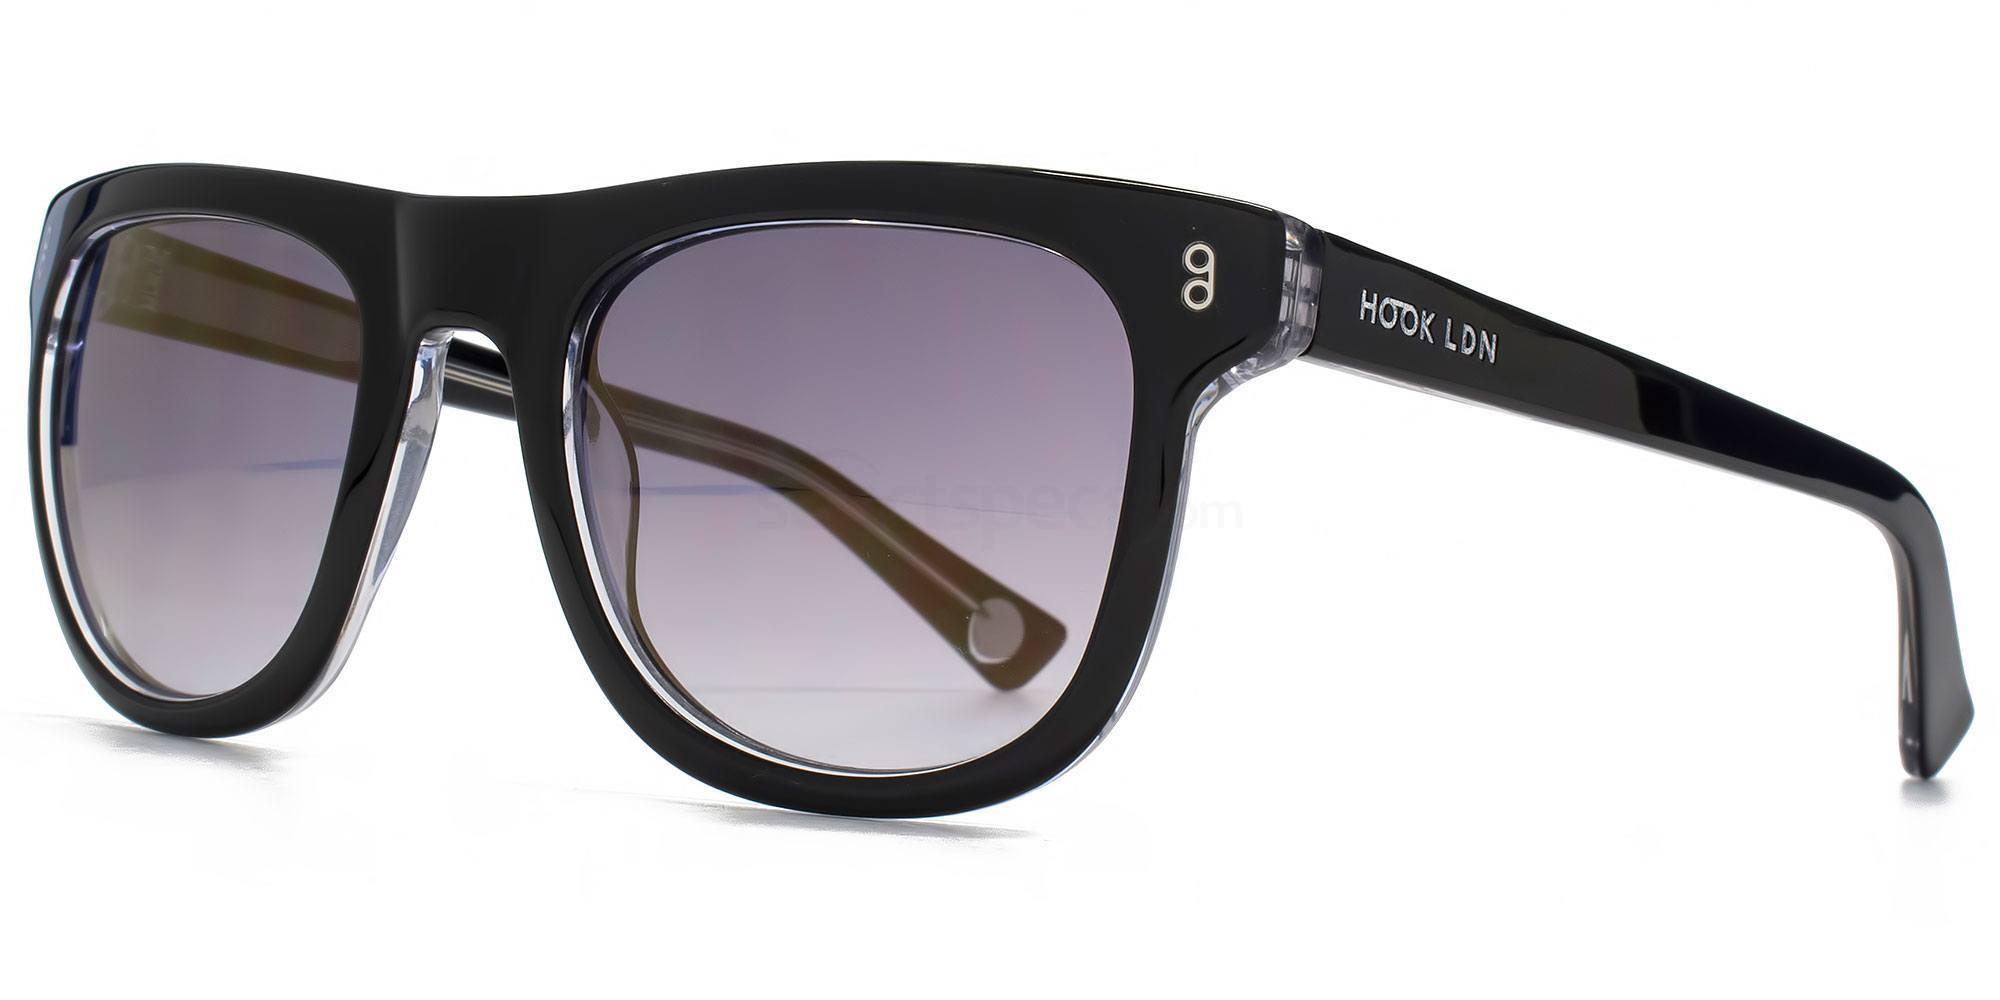 BLK HK006 - LATITUDE Sunglasses, Hook LDN